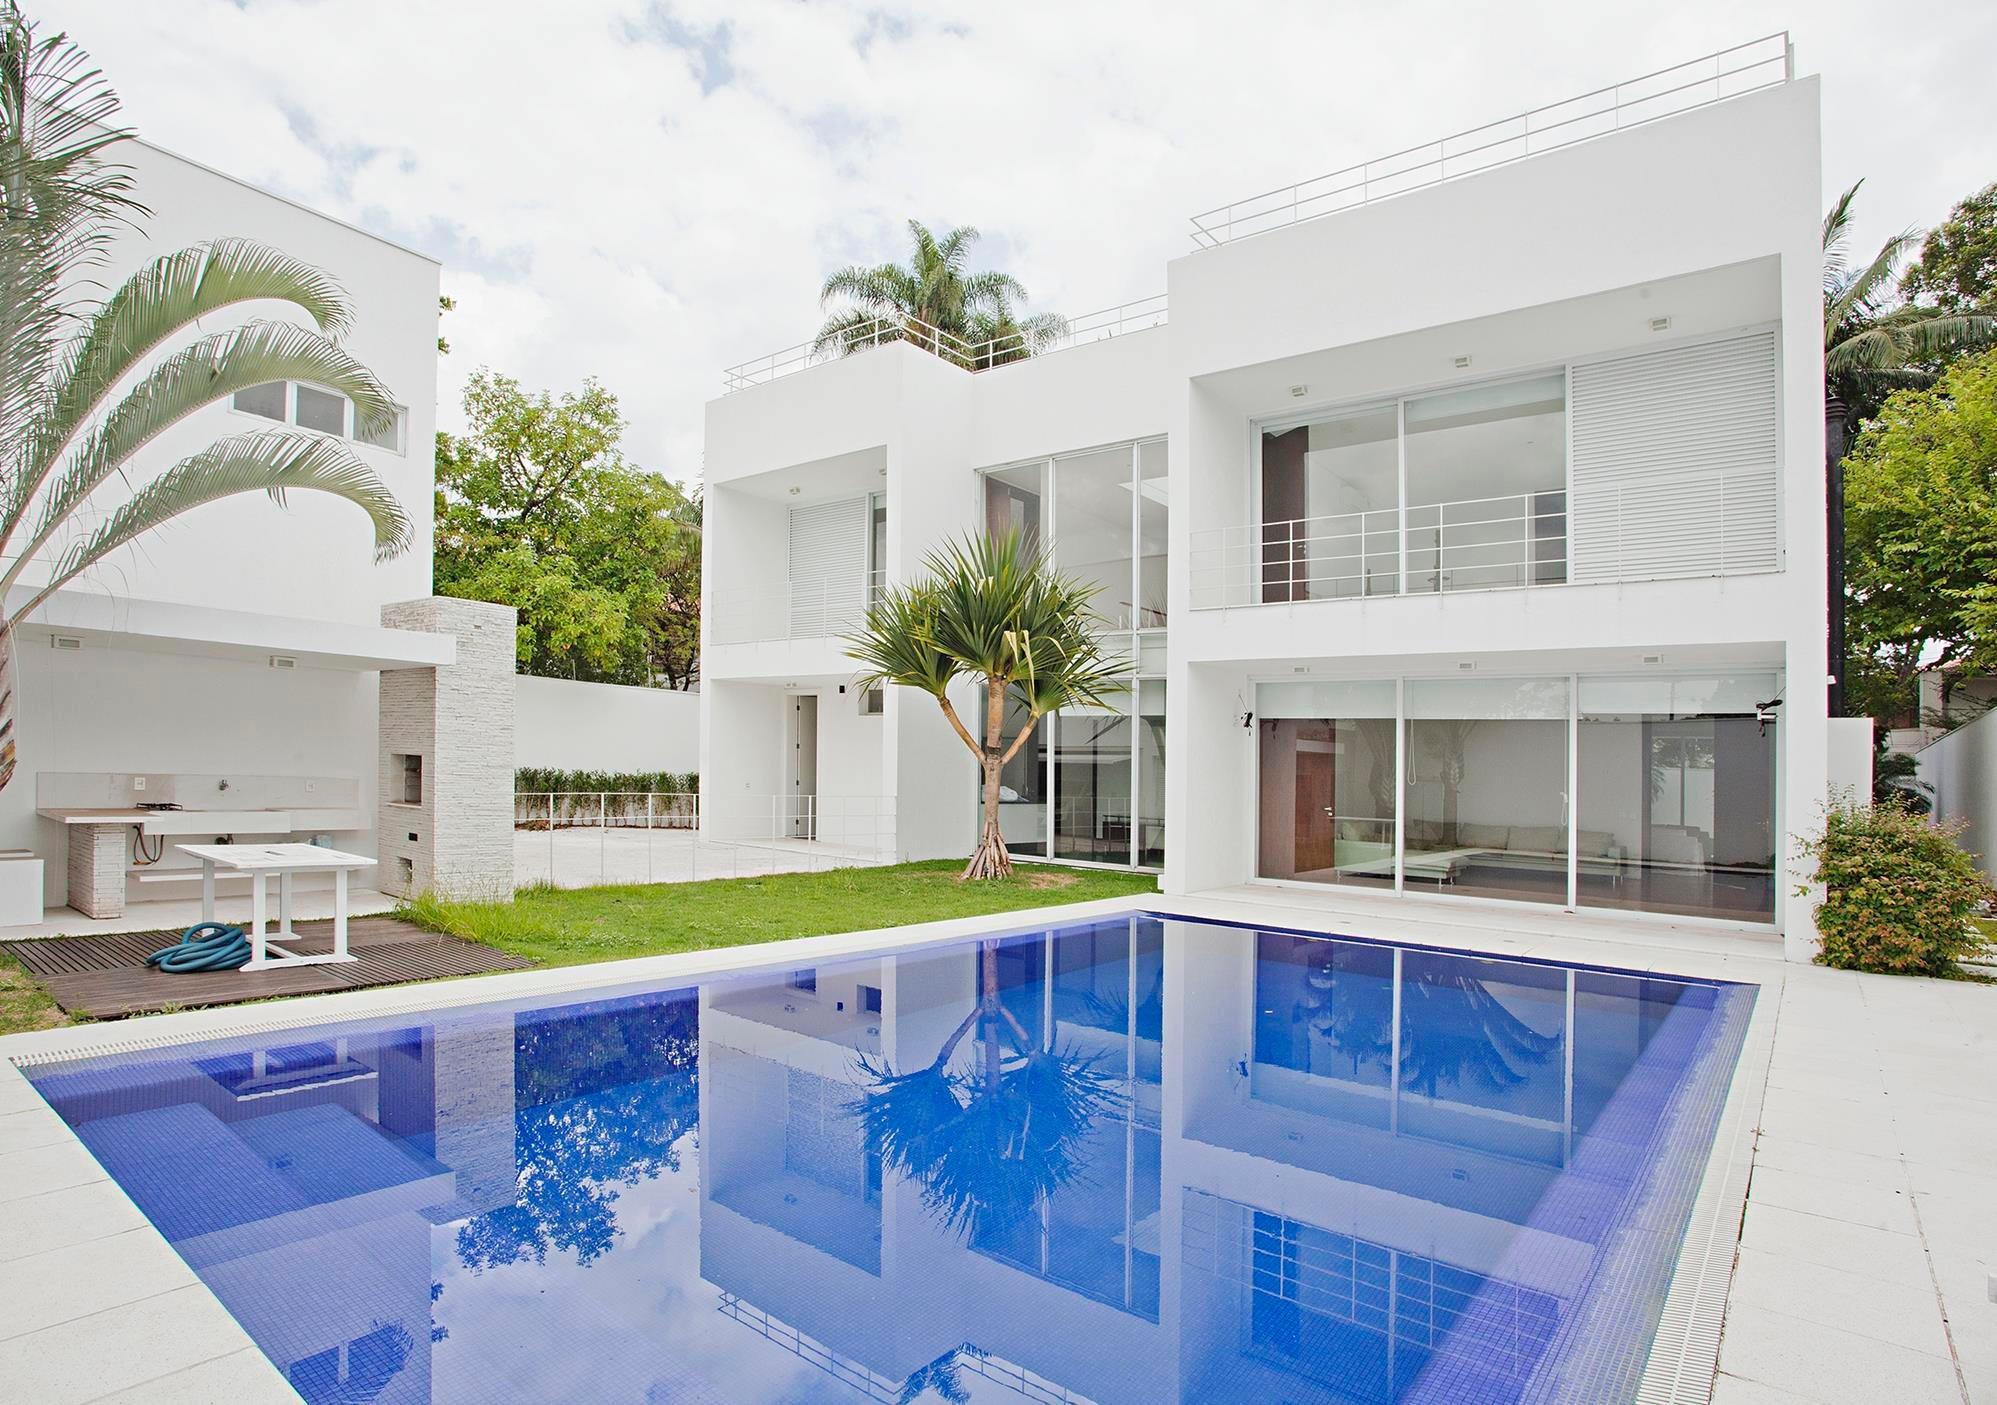 House in Jardim América, State of São Paulo, Brazil 1